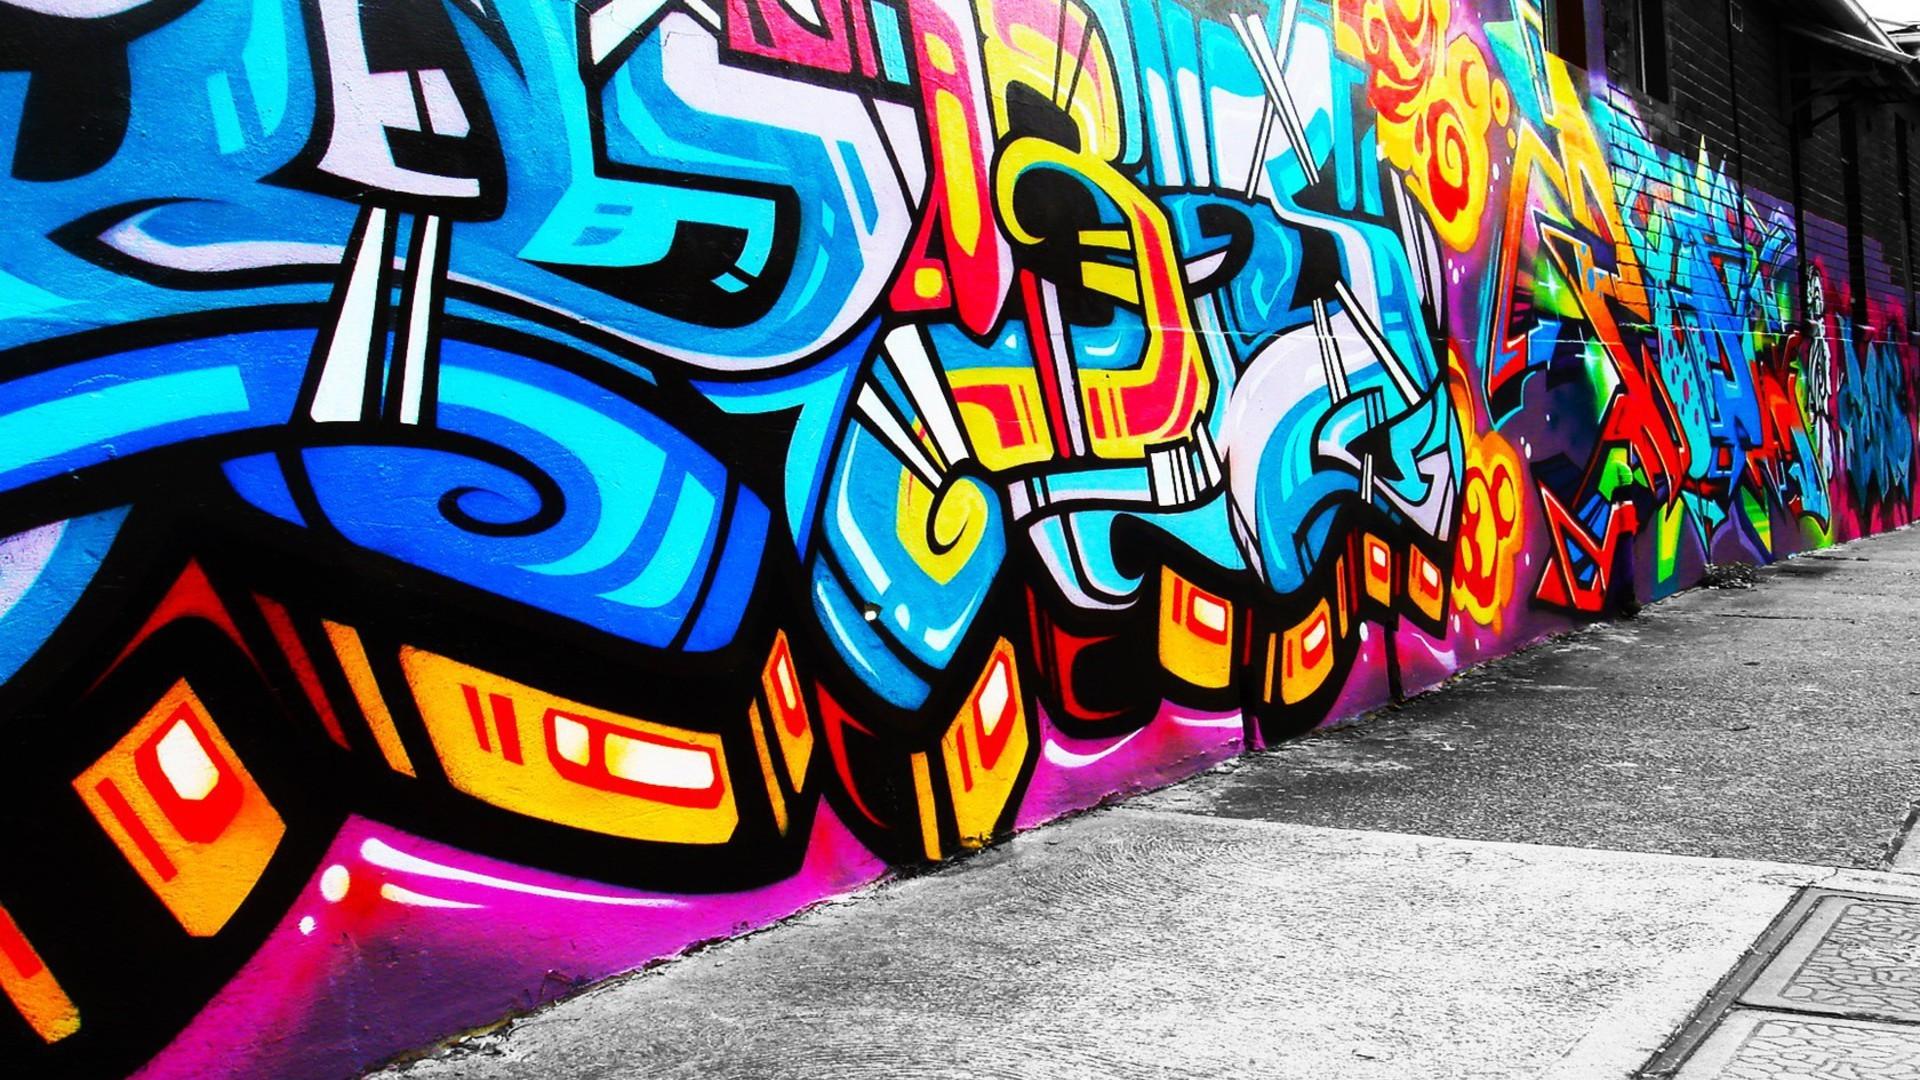 abstract graffiti cityscapes wallpaper